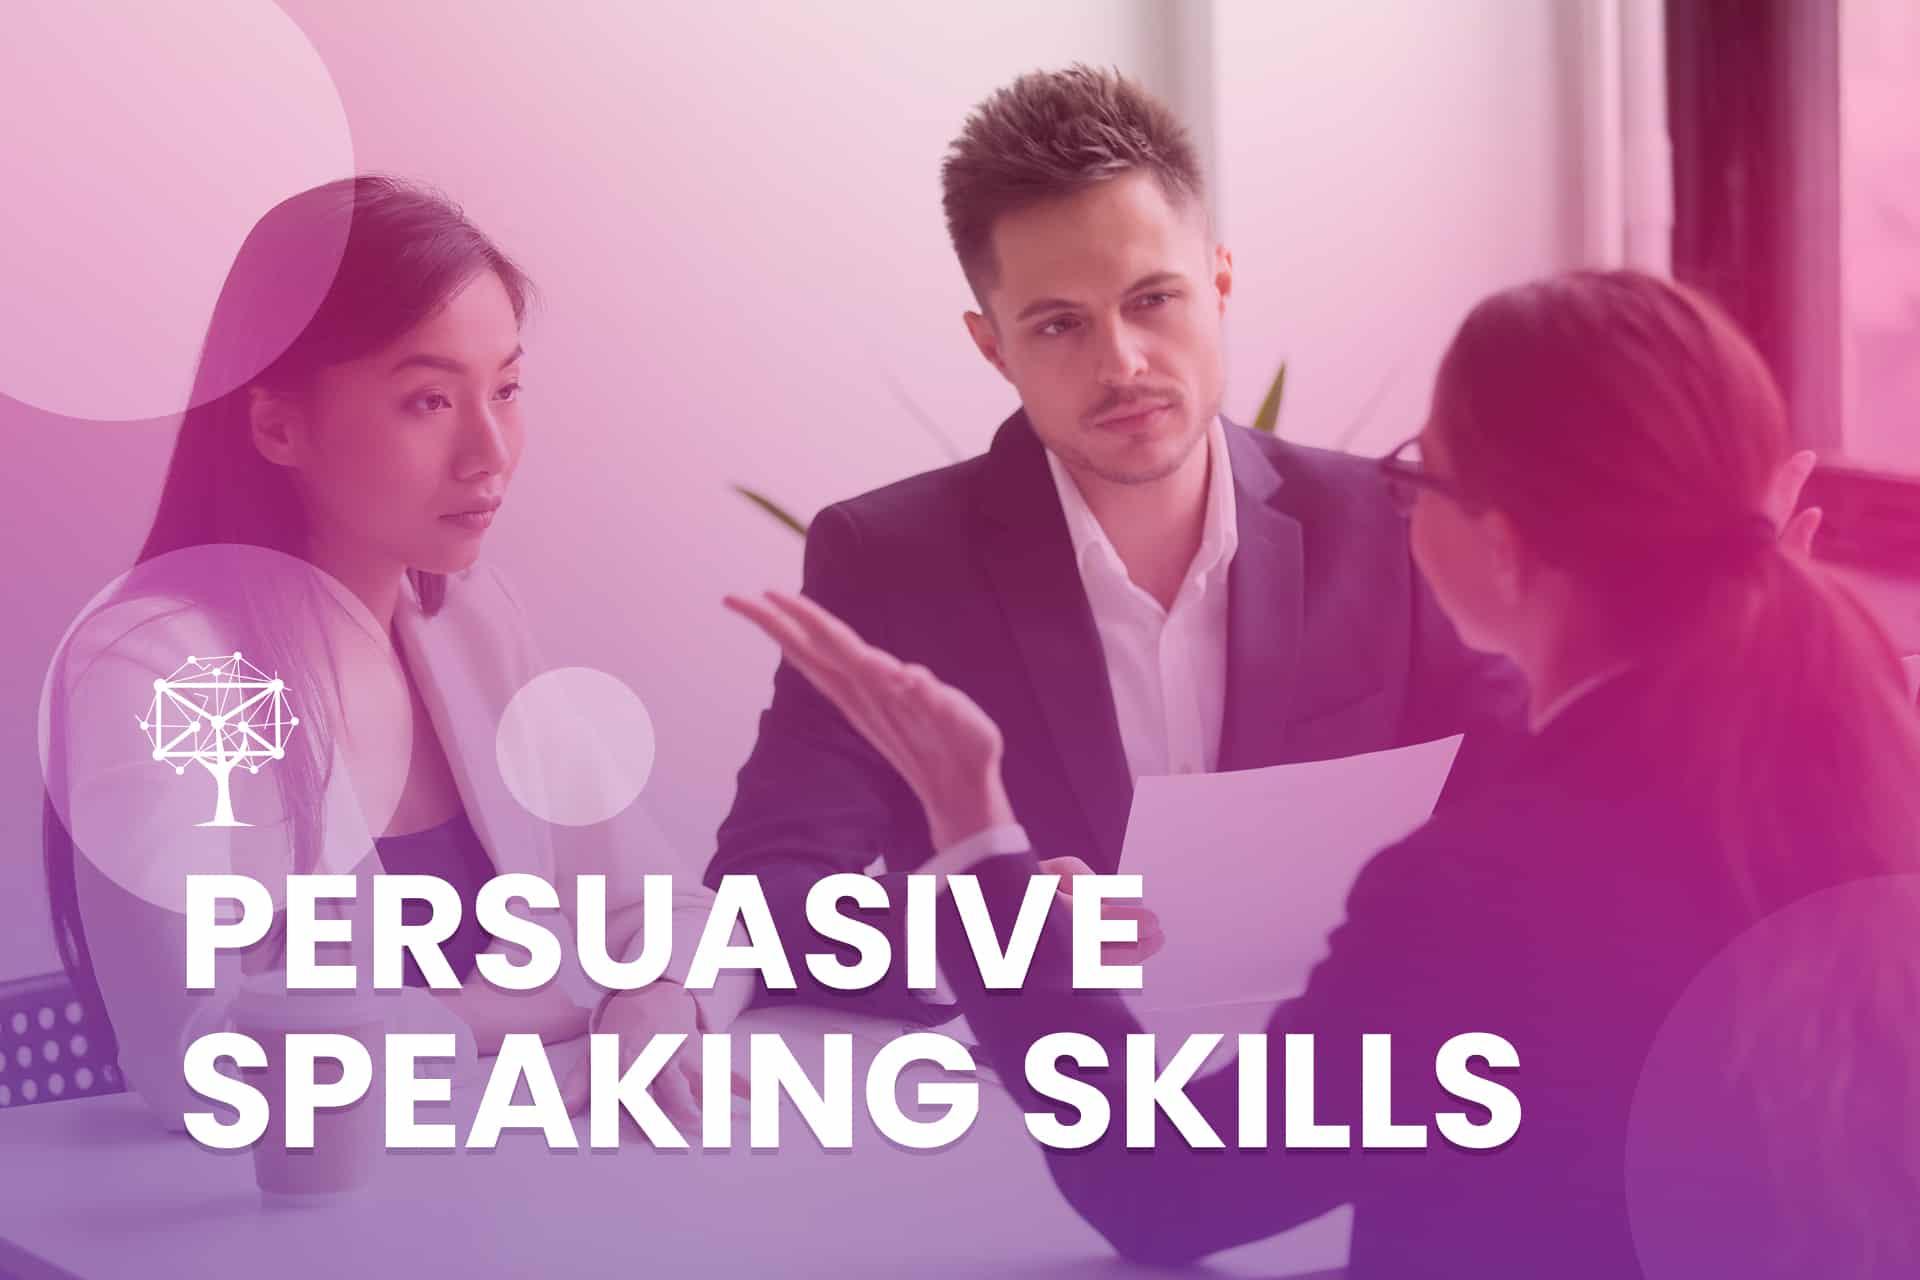 Persuasive Speaking Skills for customer service